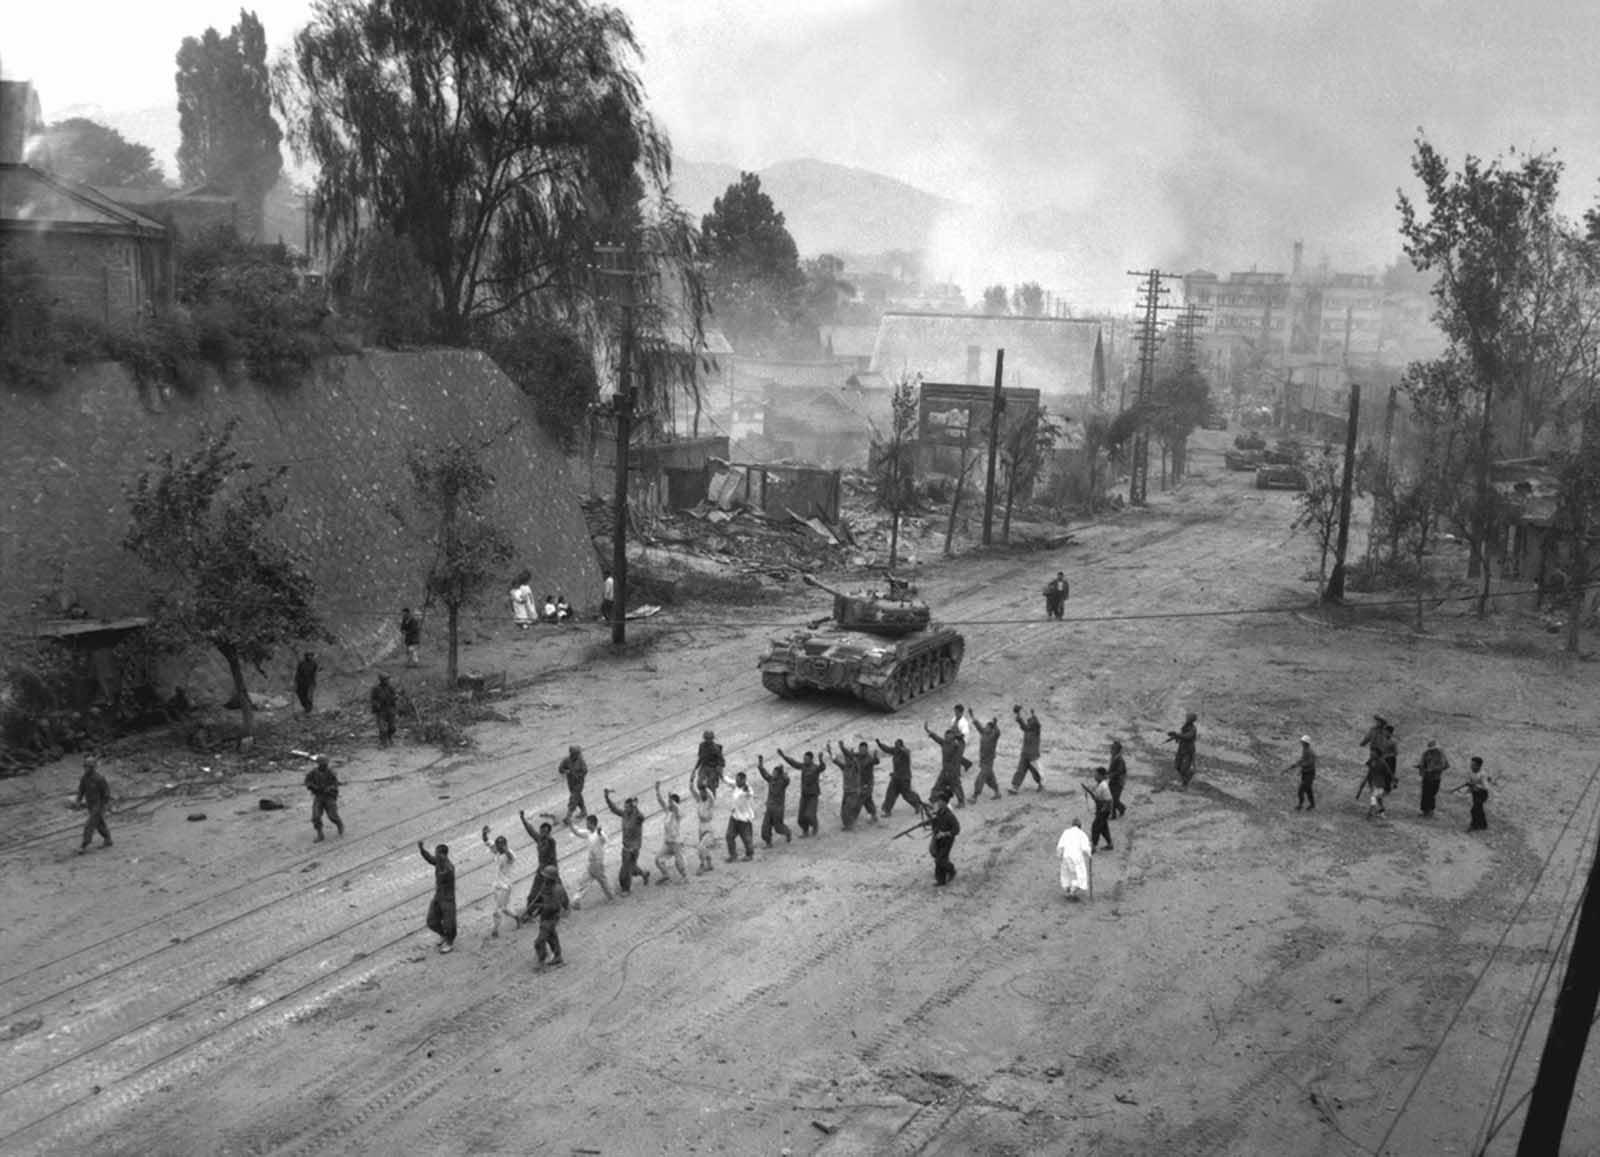 A U.S. Marine tank follows a line of prisoners of war down a village street. September 26, 1950.